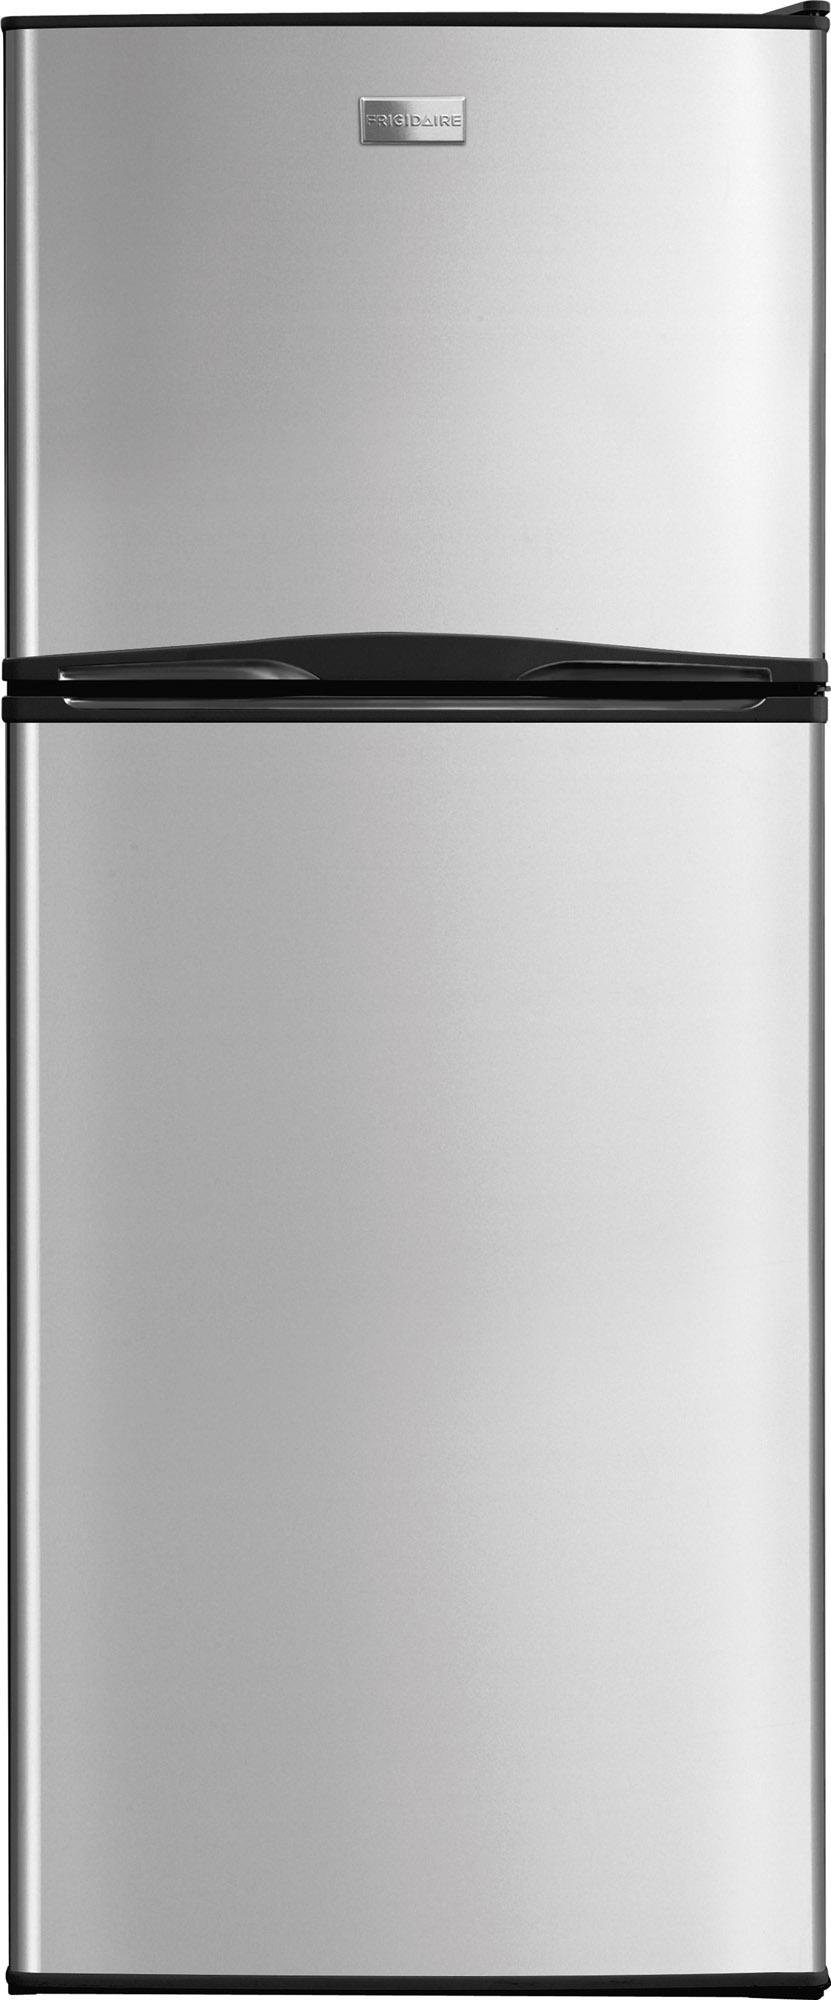 Frigidaire Top Freezer Refrigerators 11.5 Cu. Ft. Top Freezer Refrigerator - Item Number: FFET1222QS